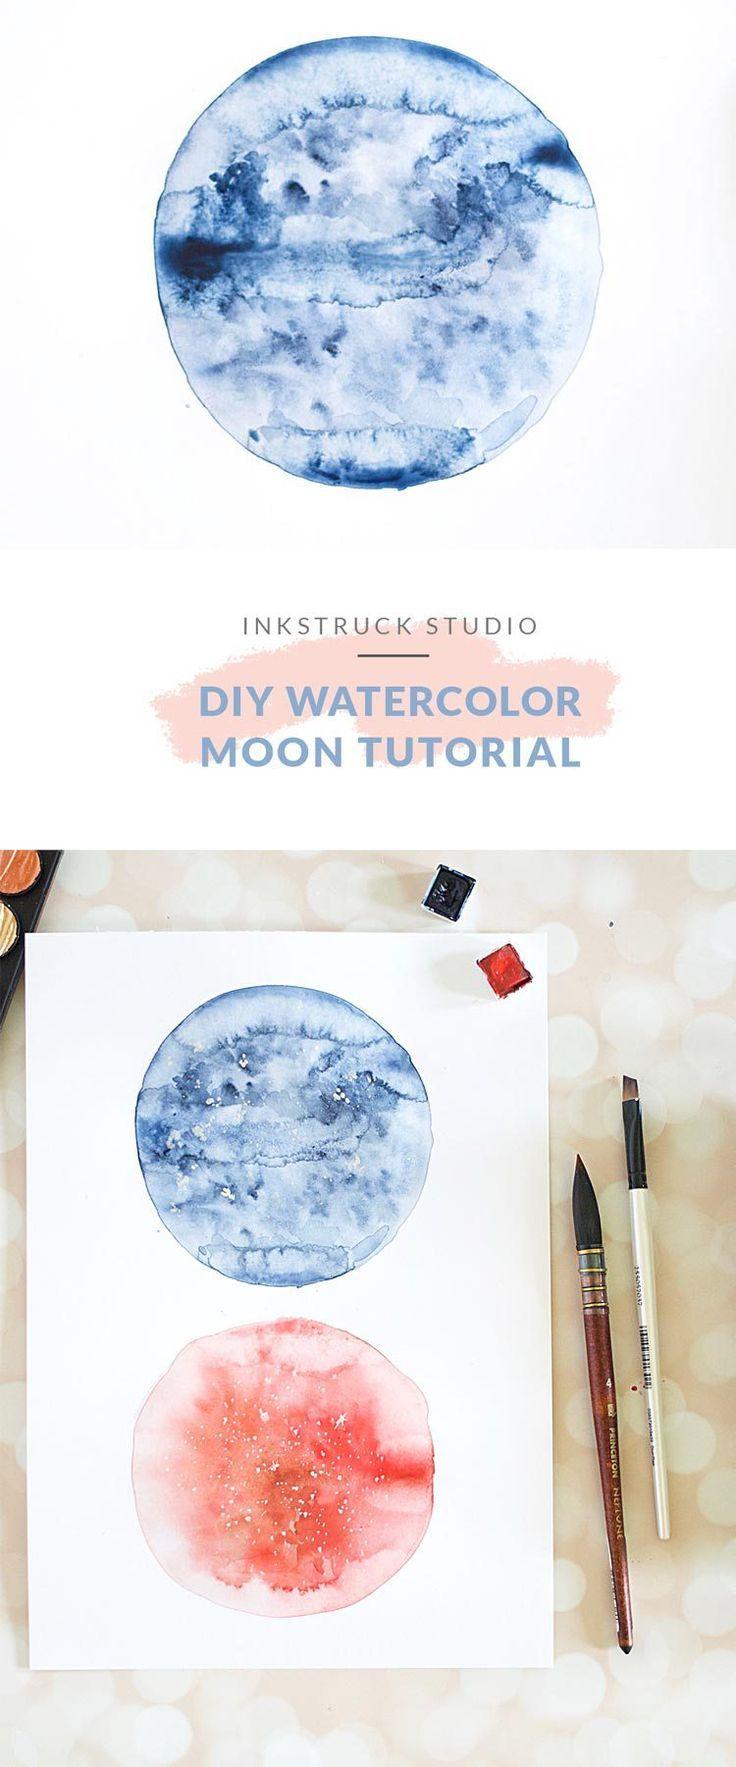 Watercolor Moon Diy Inksrtuck Studio Image Clipart Aquarelle